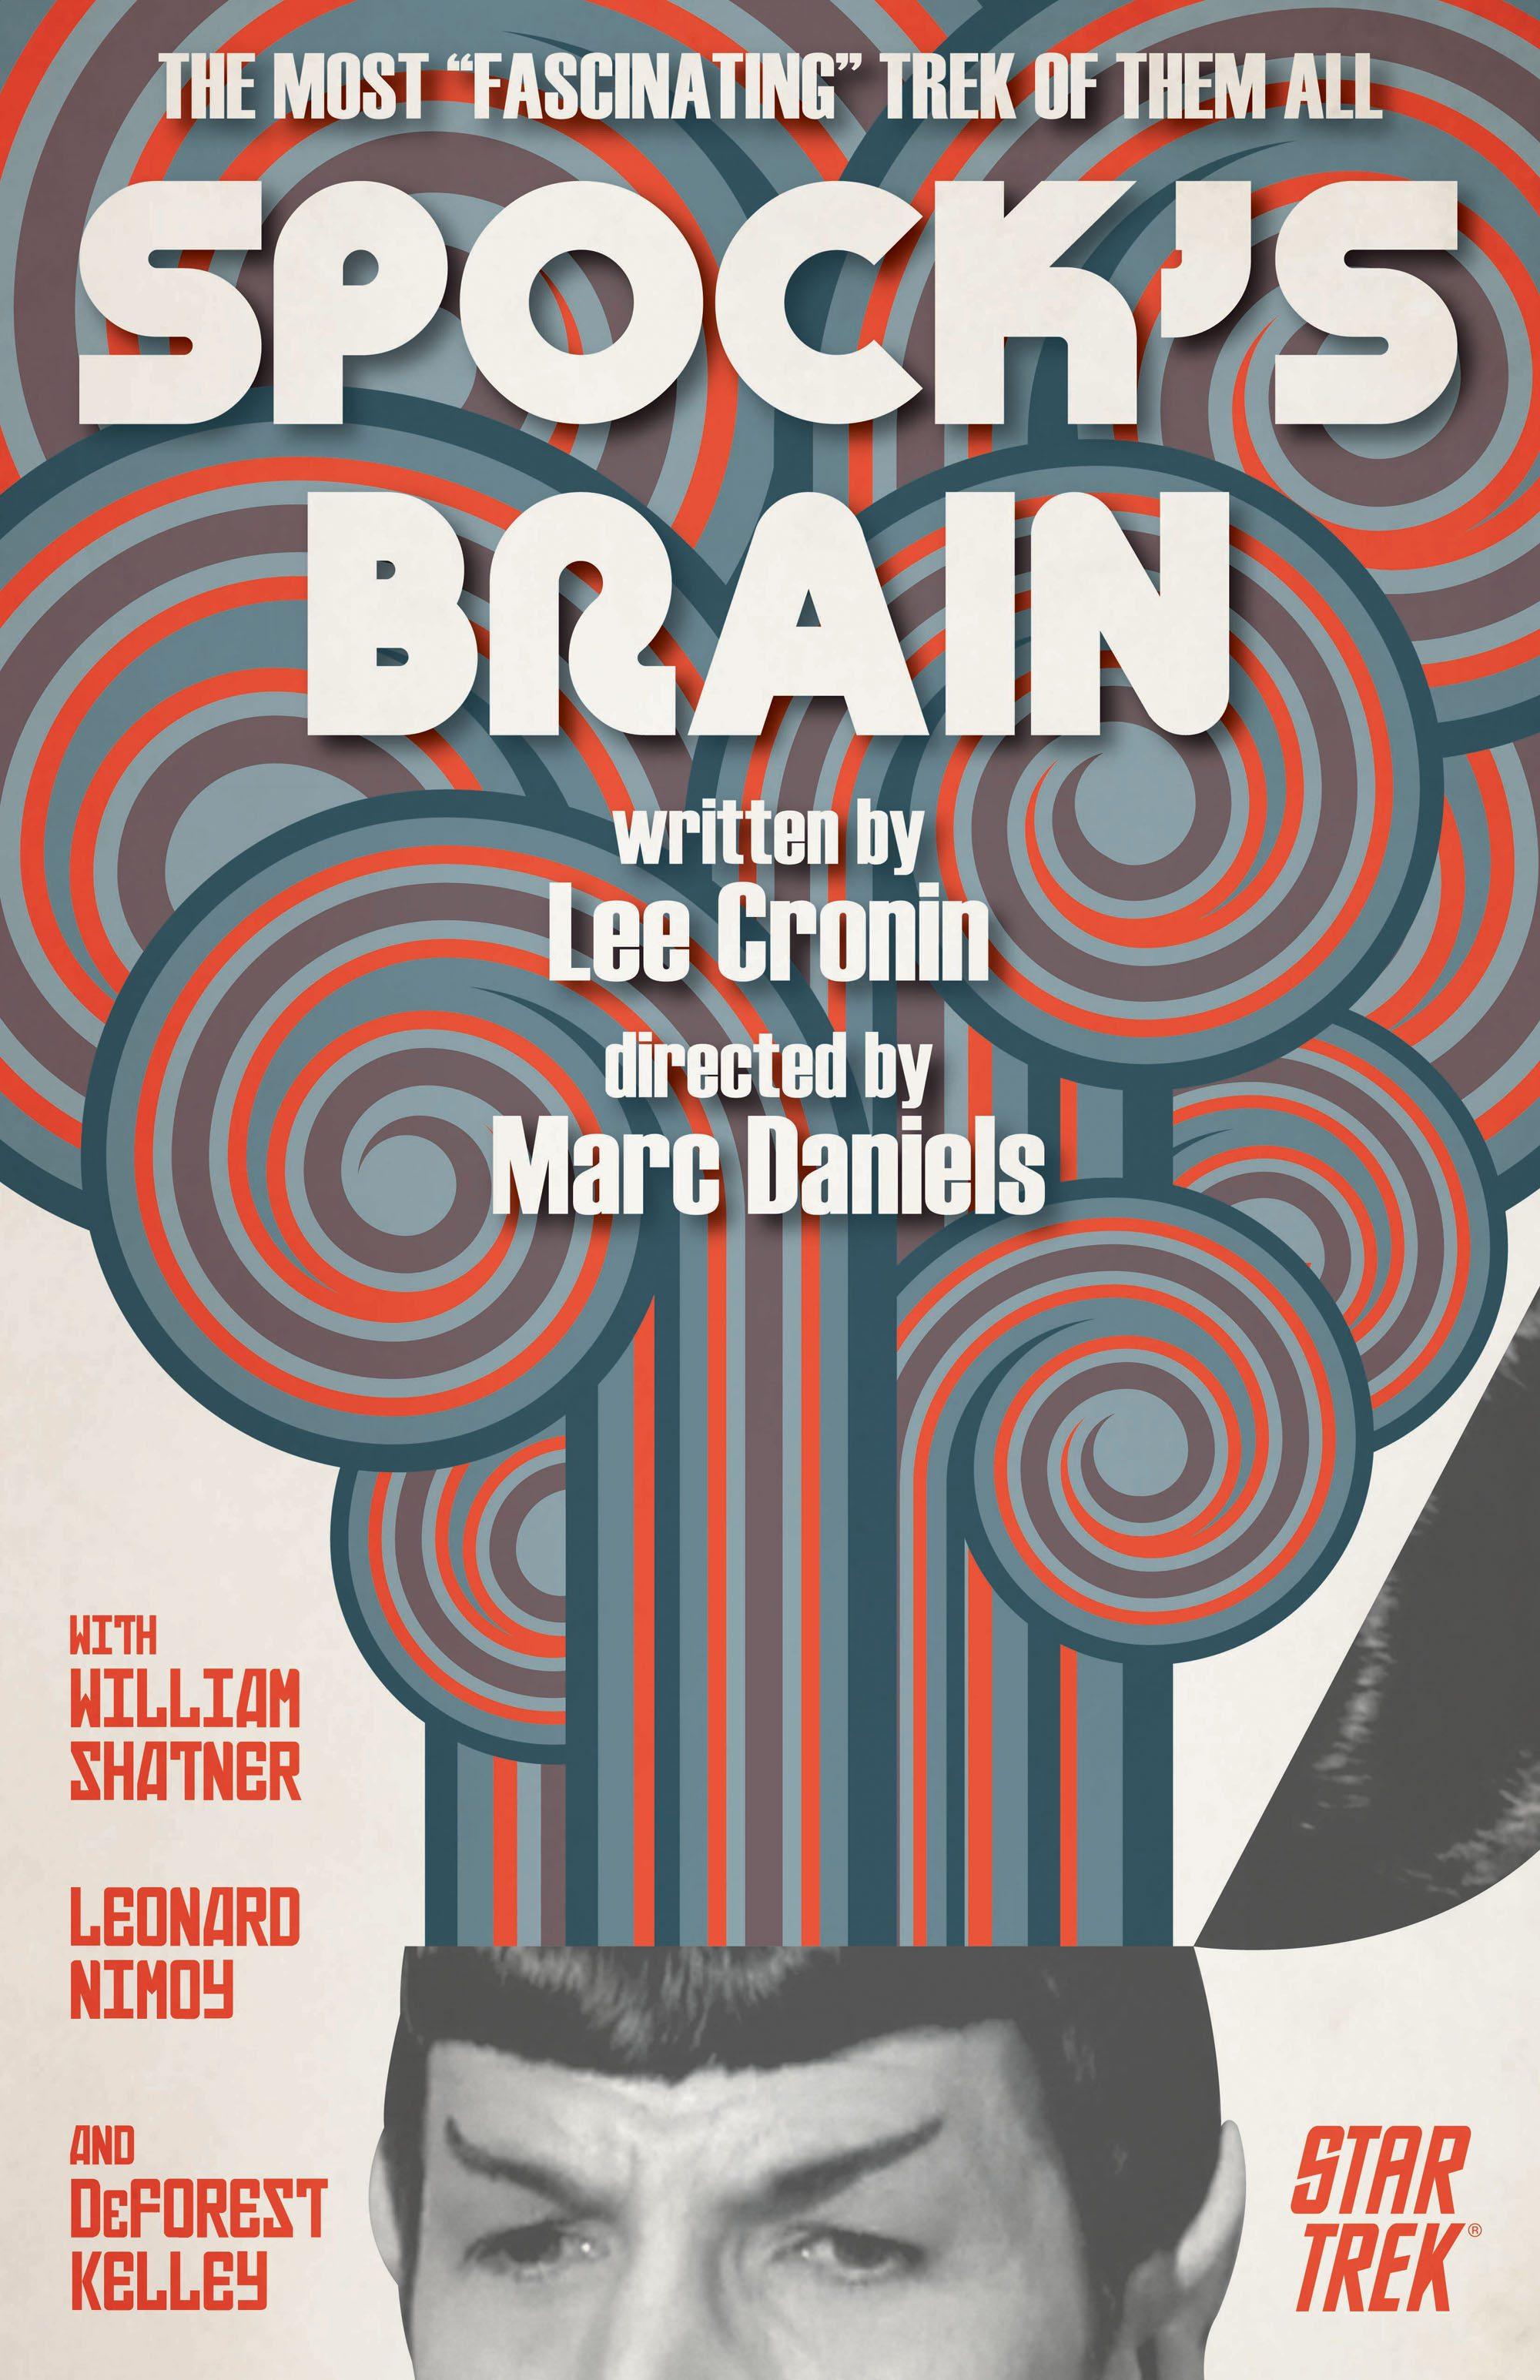 Spock's Brain